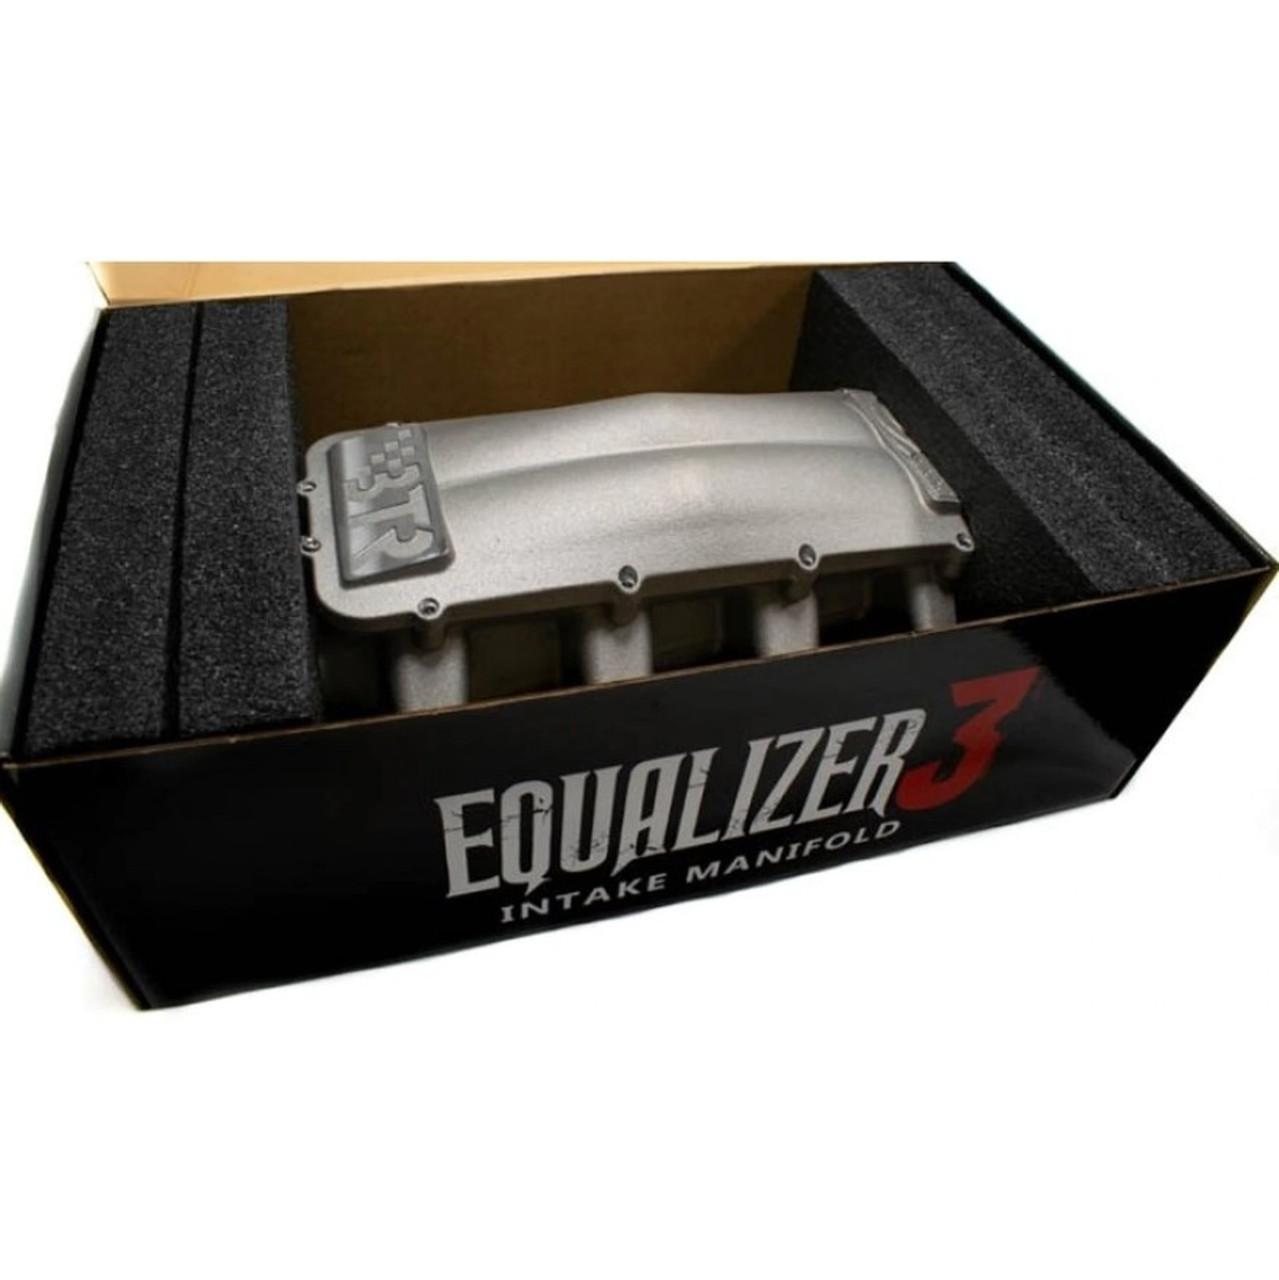 BTR Equalizer 3 Intake Manifold - Square Port Head Brian Tooley IMA-03 LS3 LSA L92 6.2